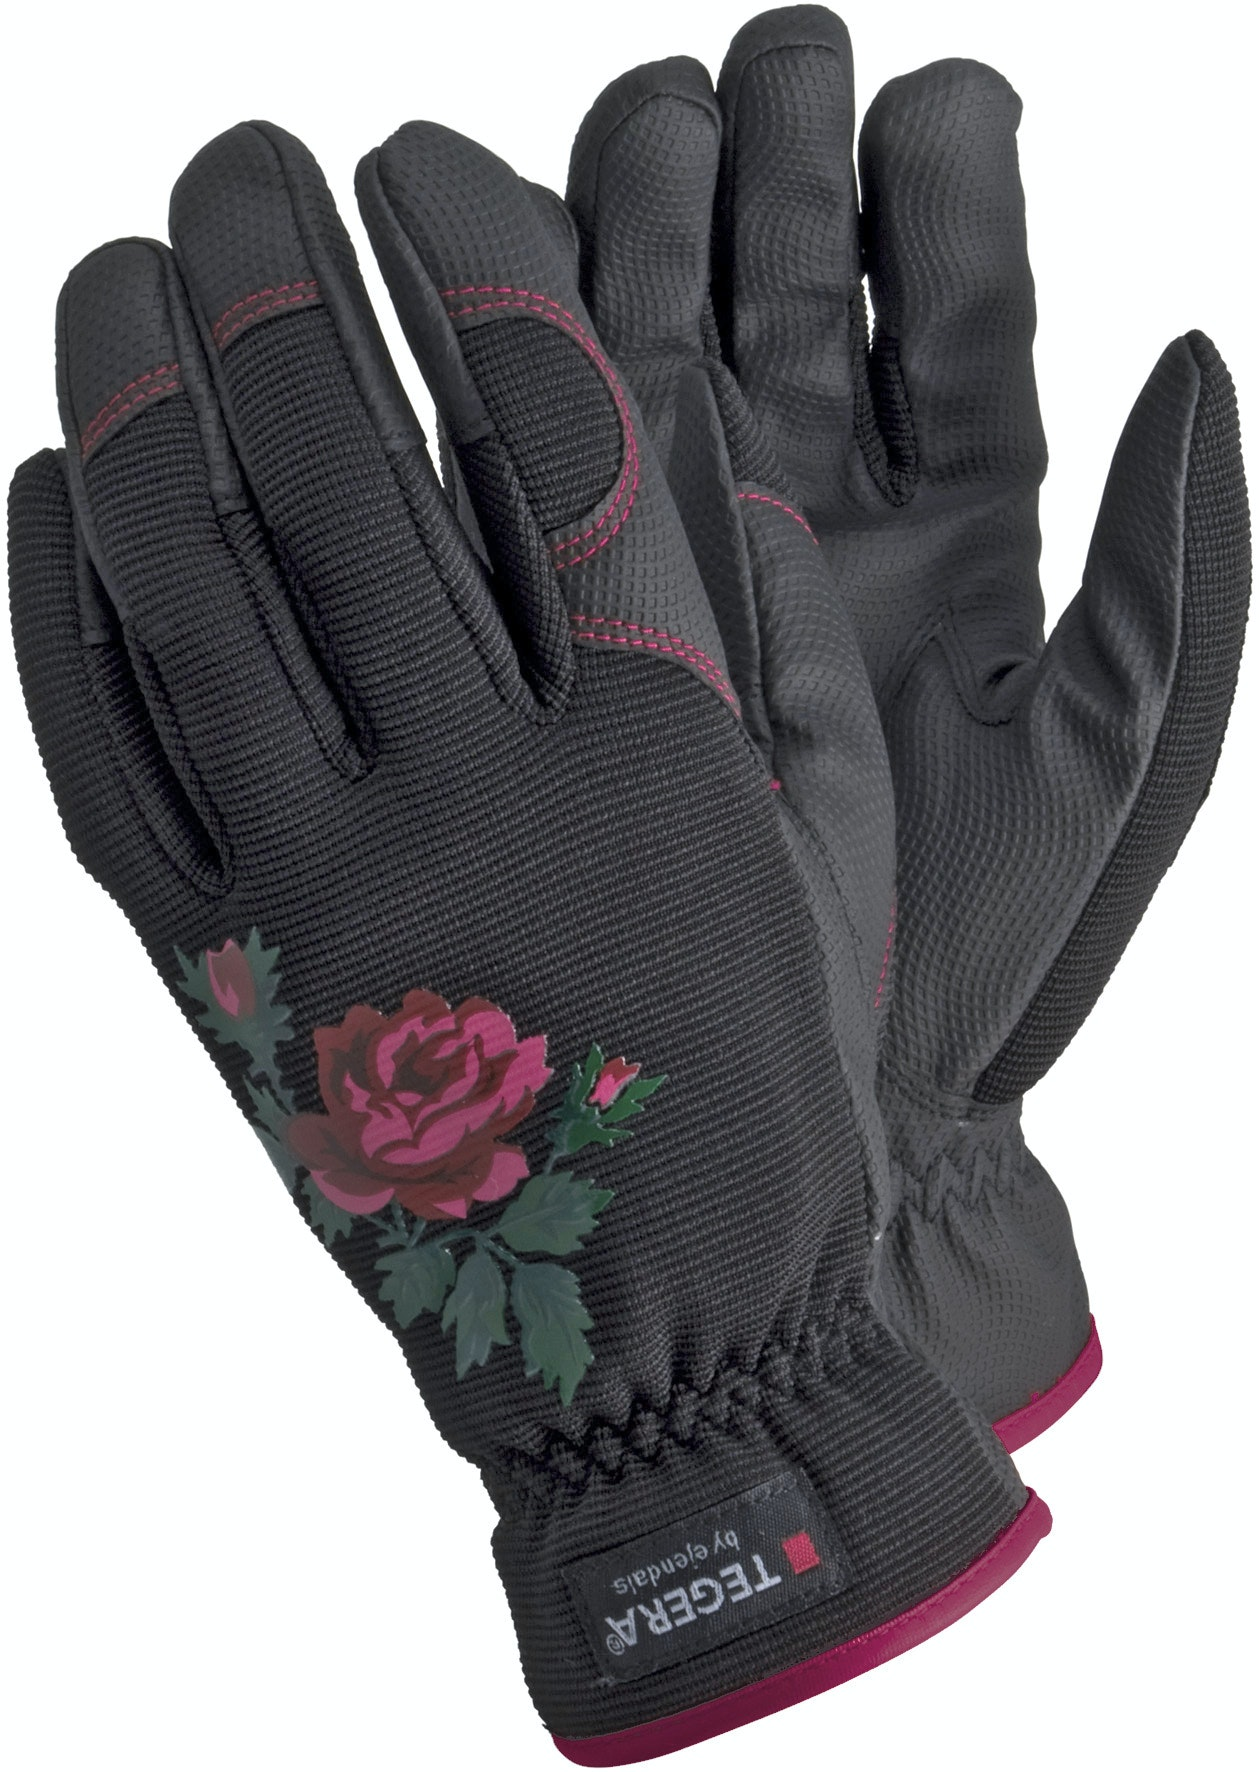 Handske Tegera 90030 Micro-Pu Stl 7